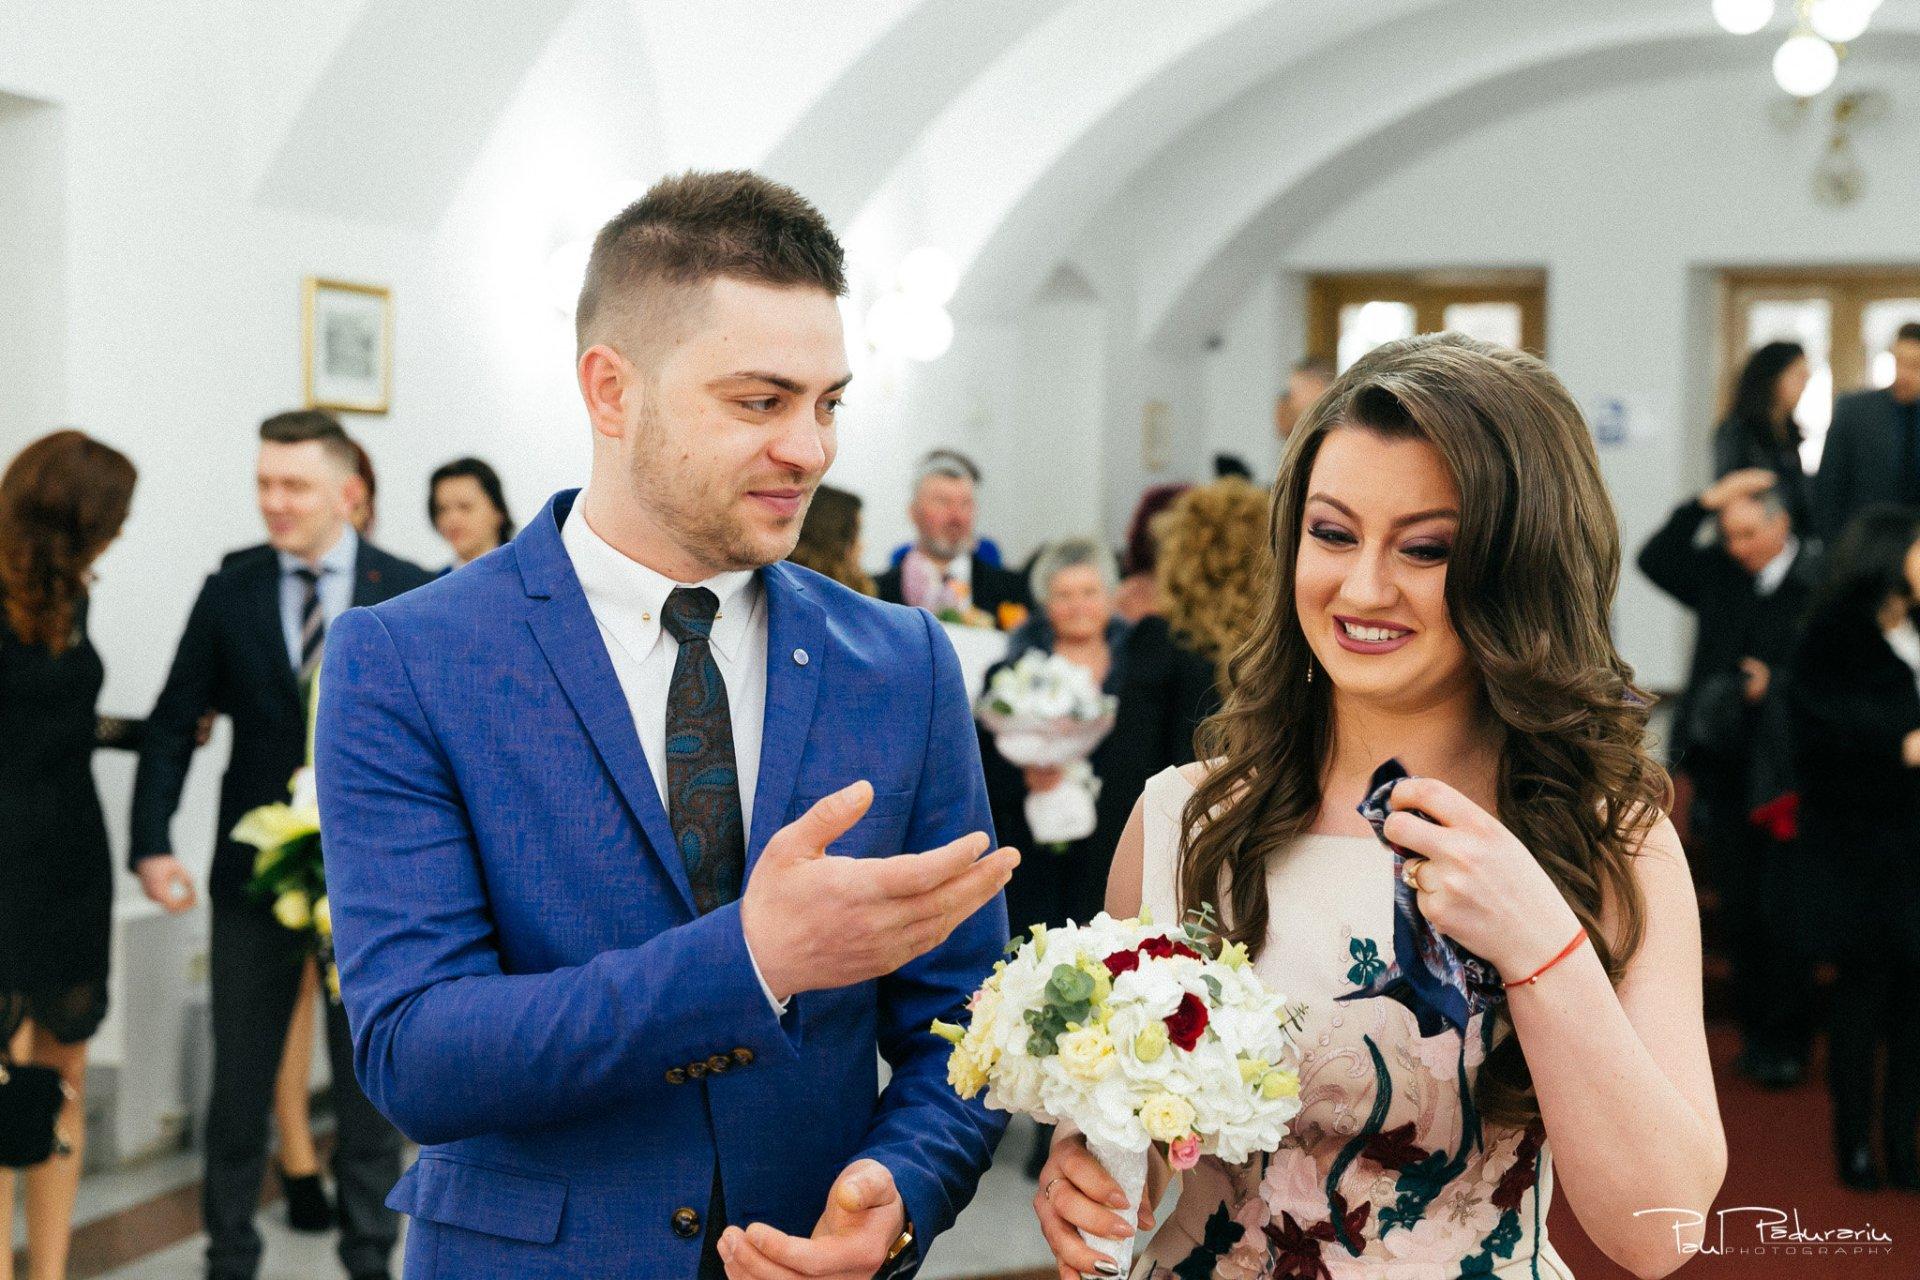 Emotii Ariadna si Iulian cununie civila fotograf nunta Iasi www.paulpadurariu.ro © 2017 Paul Padurariu